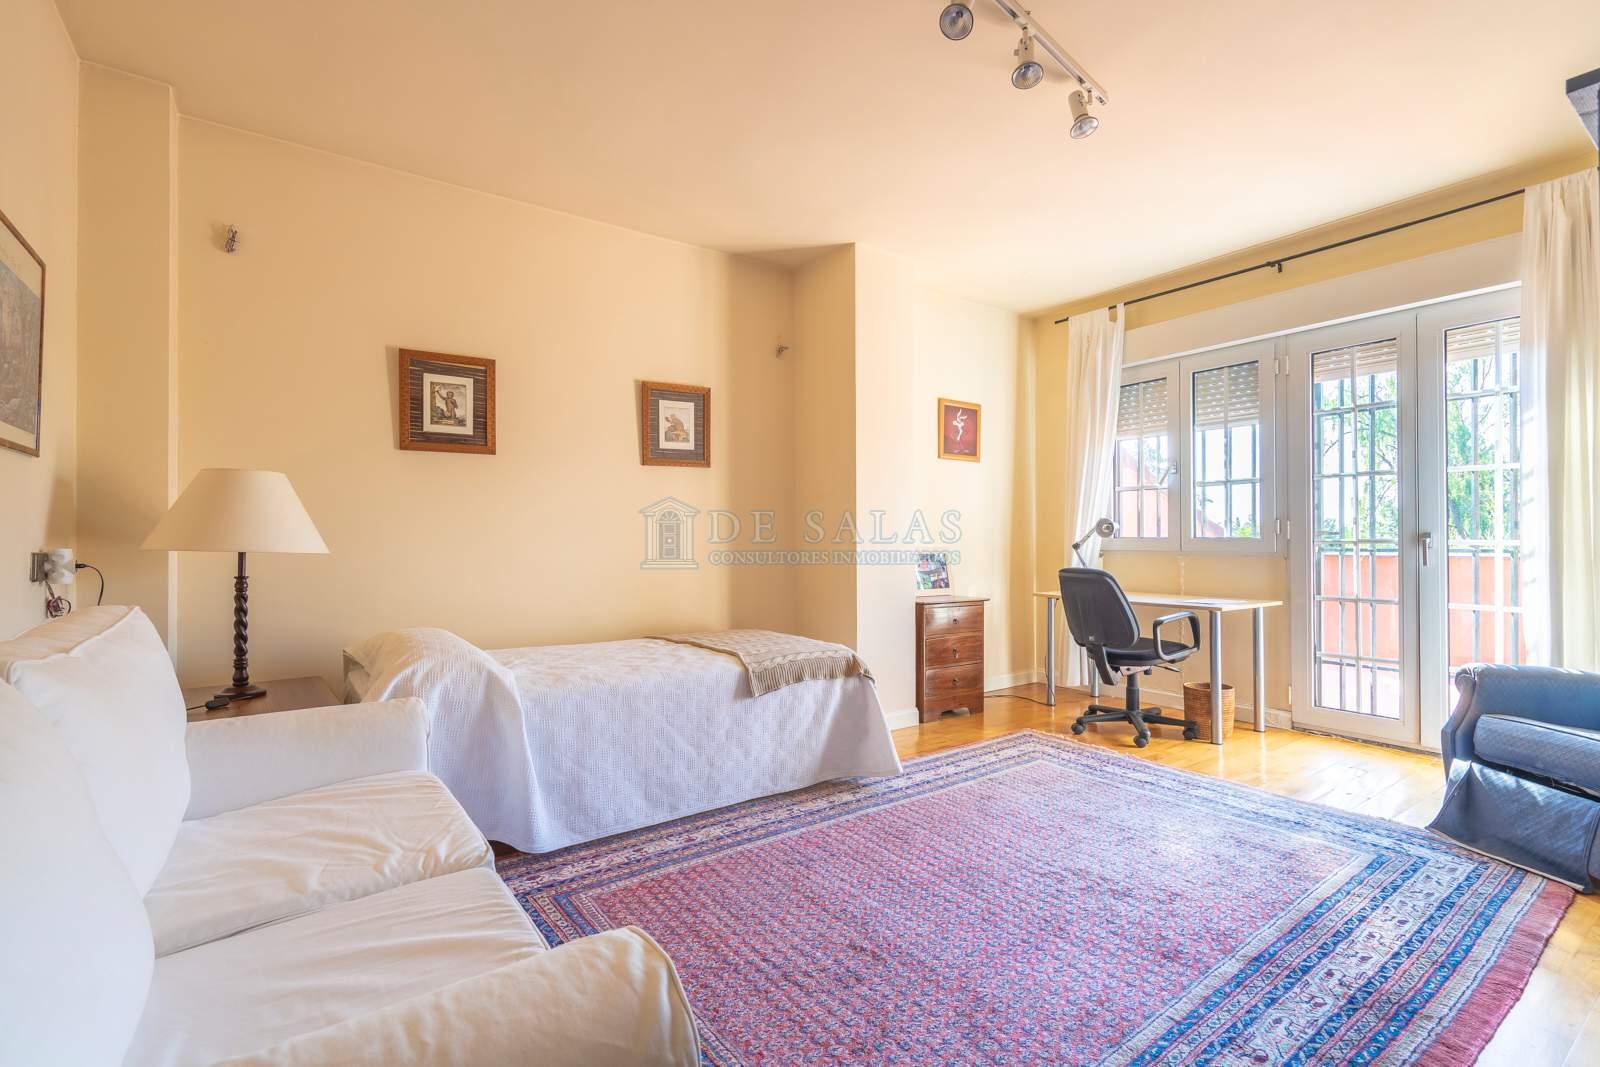 35-Dormitorio (1) Chalet La Moraleja